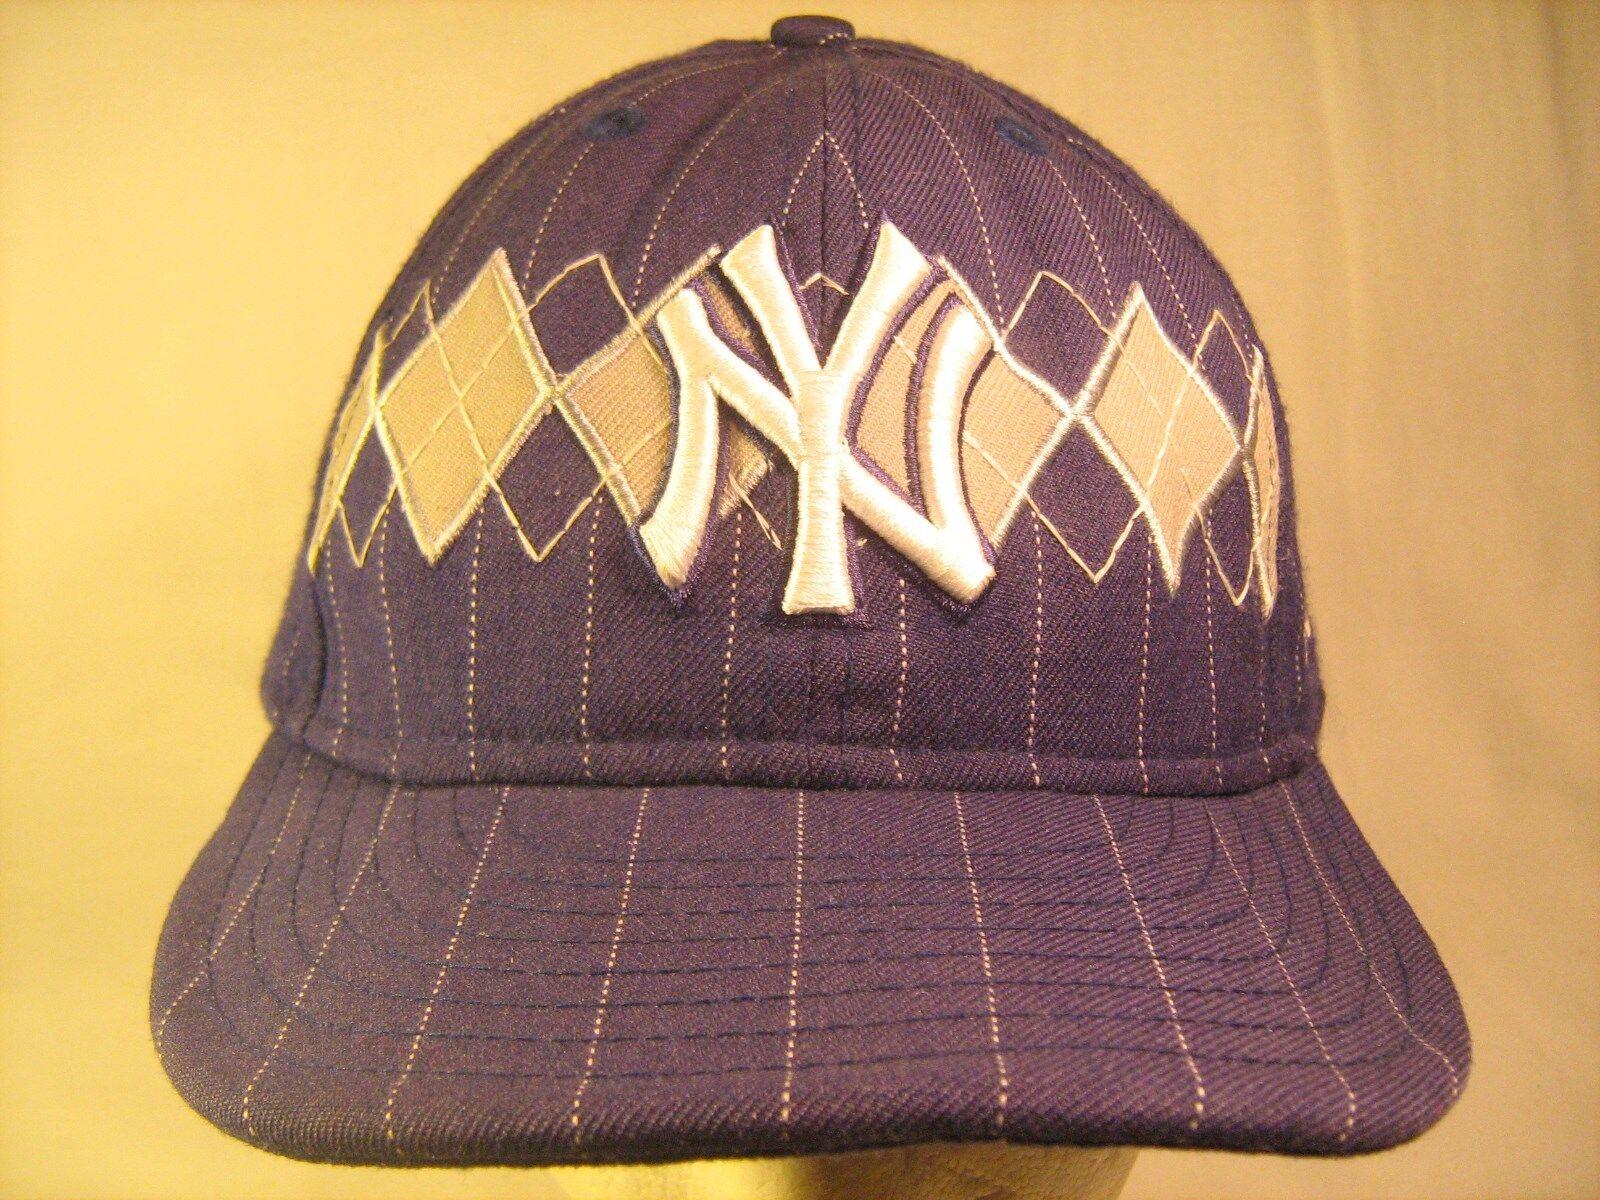 Men's Cap MLB NEW YORK YANKEES 59FIFTY NEW Size 7 1/2 Blue NEW 59FIFTY ERA [M3e] ec9df5